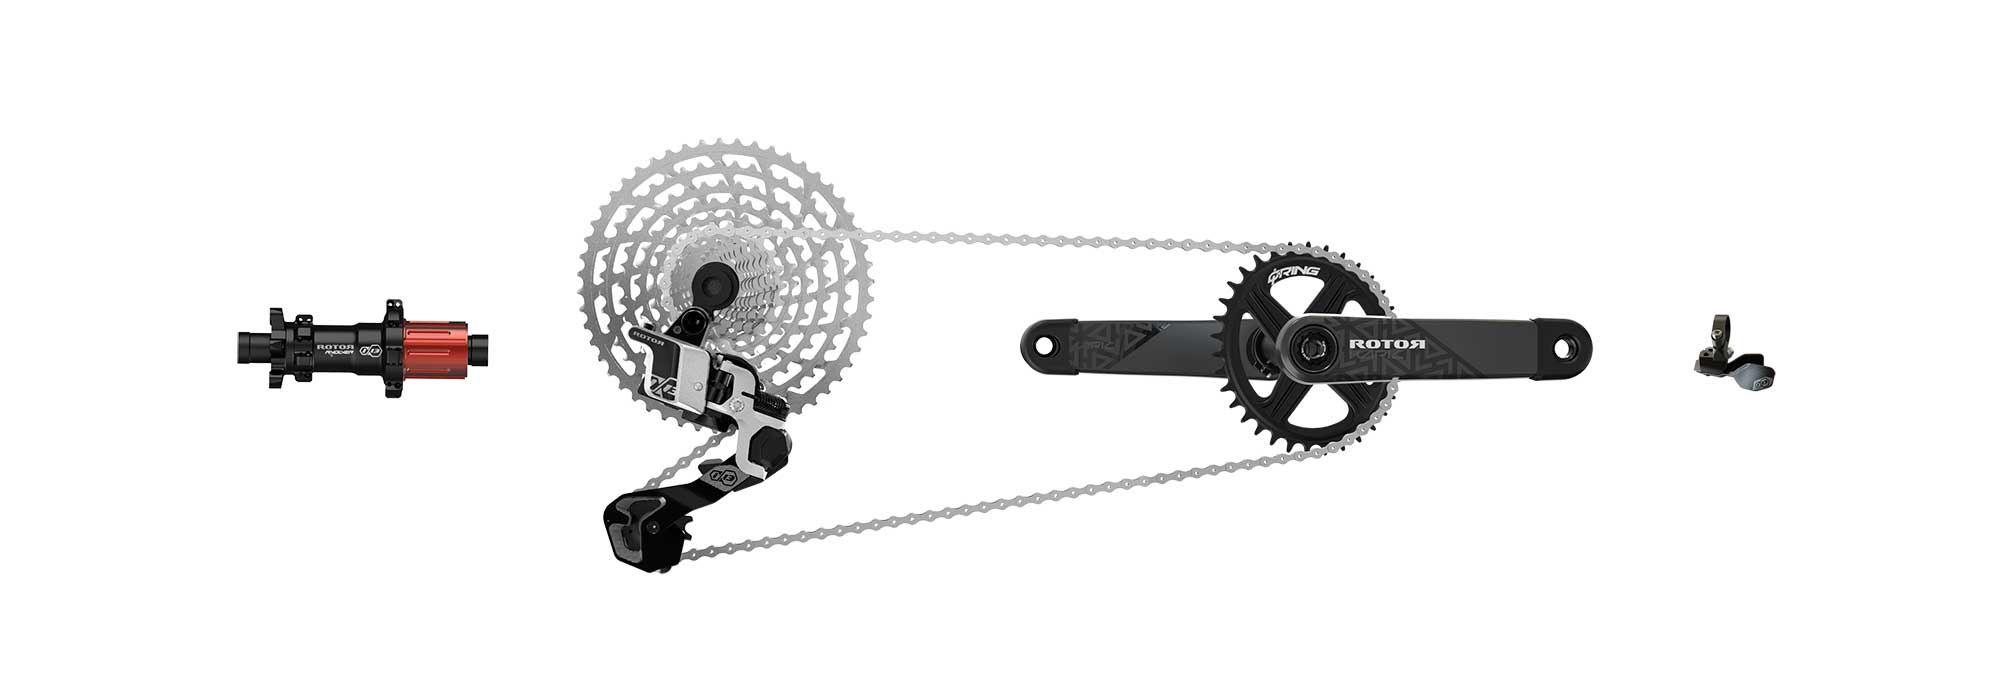 rotor_kit_3